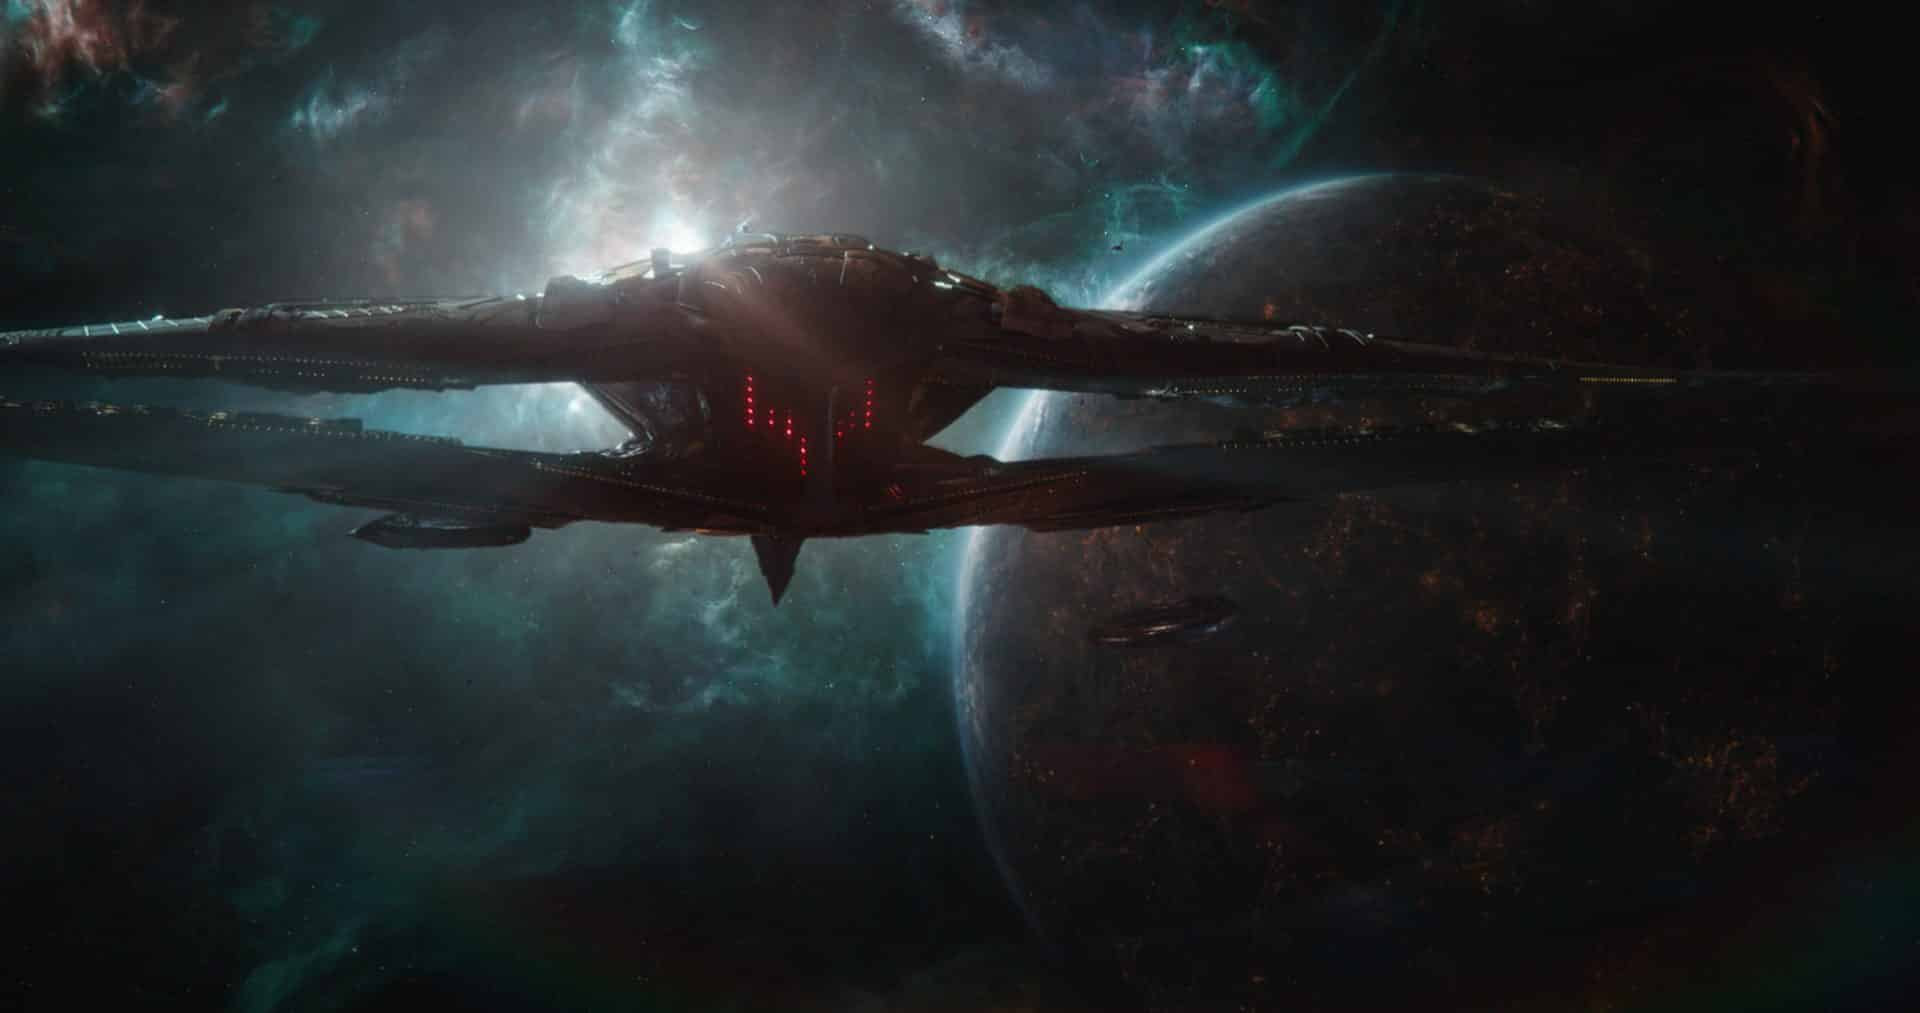 vizuálne efekty filmu Avengers: Endgame